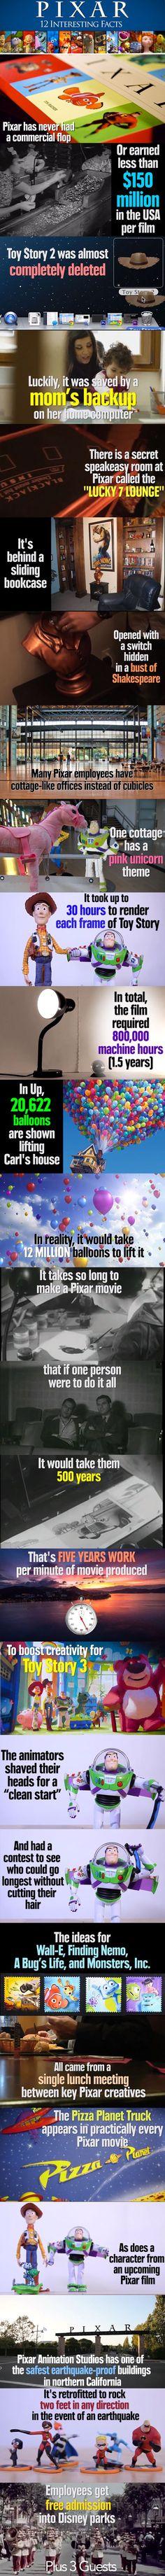 FYI - 12 Interesting Facts about Disney s Pixar | #geek